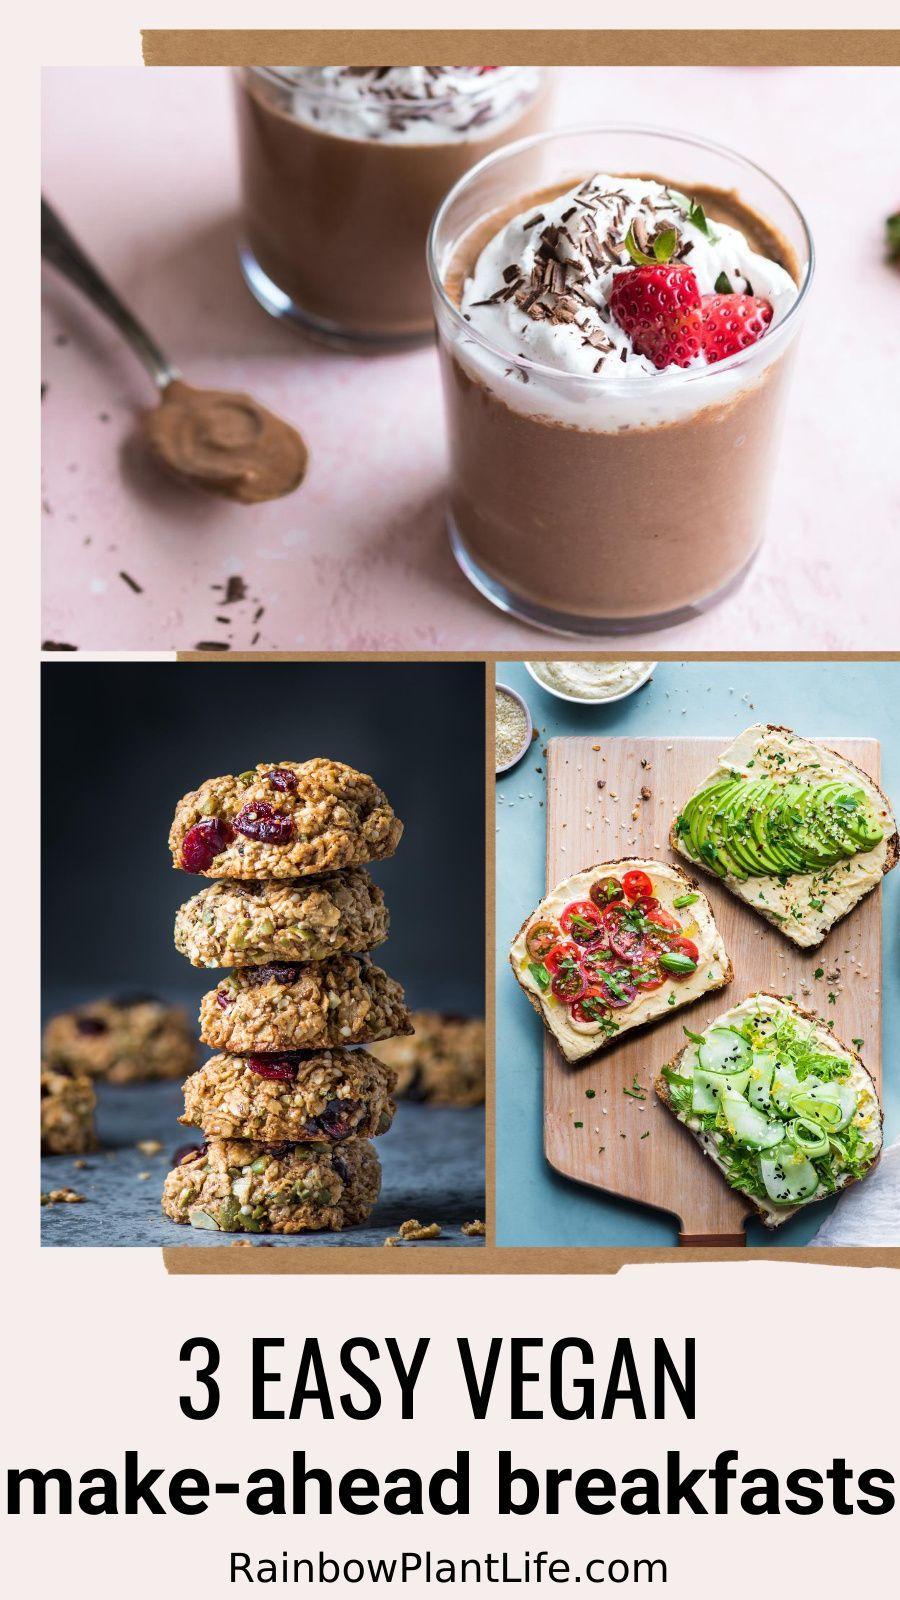 Make Ahead Breakfasts Vegan Gluten Free Oil Free Rainbow Plant Life In 2020 Make Ahead Breakfast Vegan Instant Pot Recipes Everyday Food